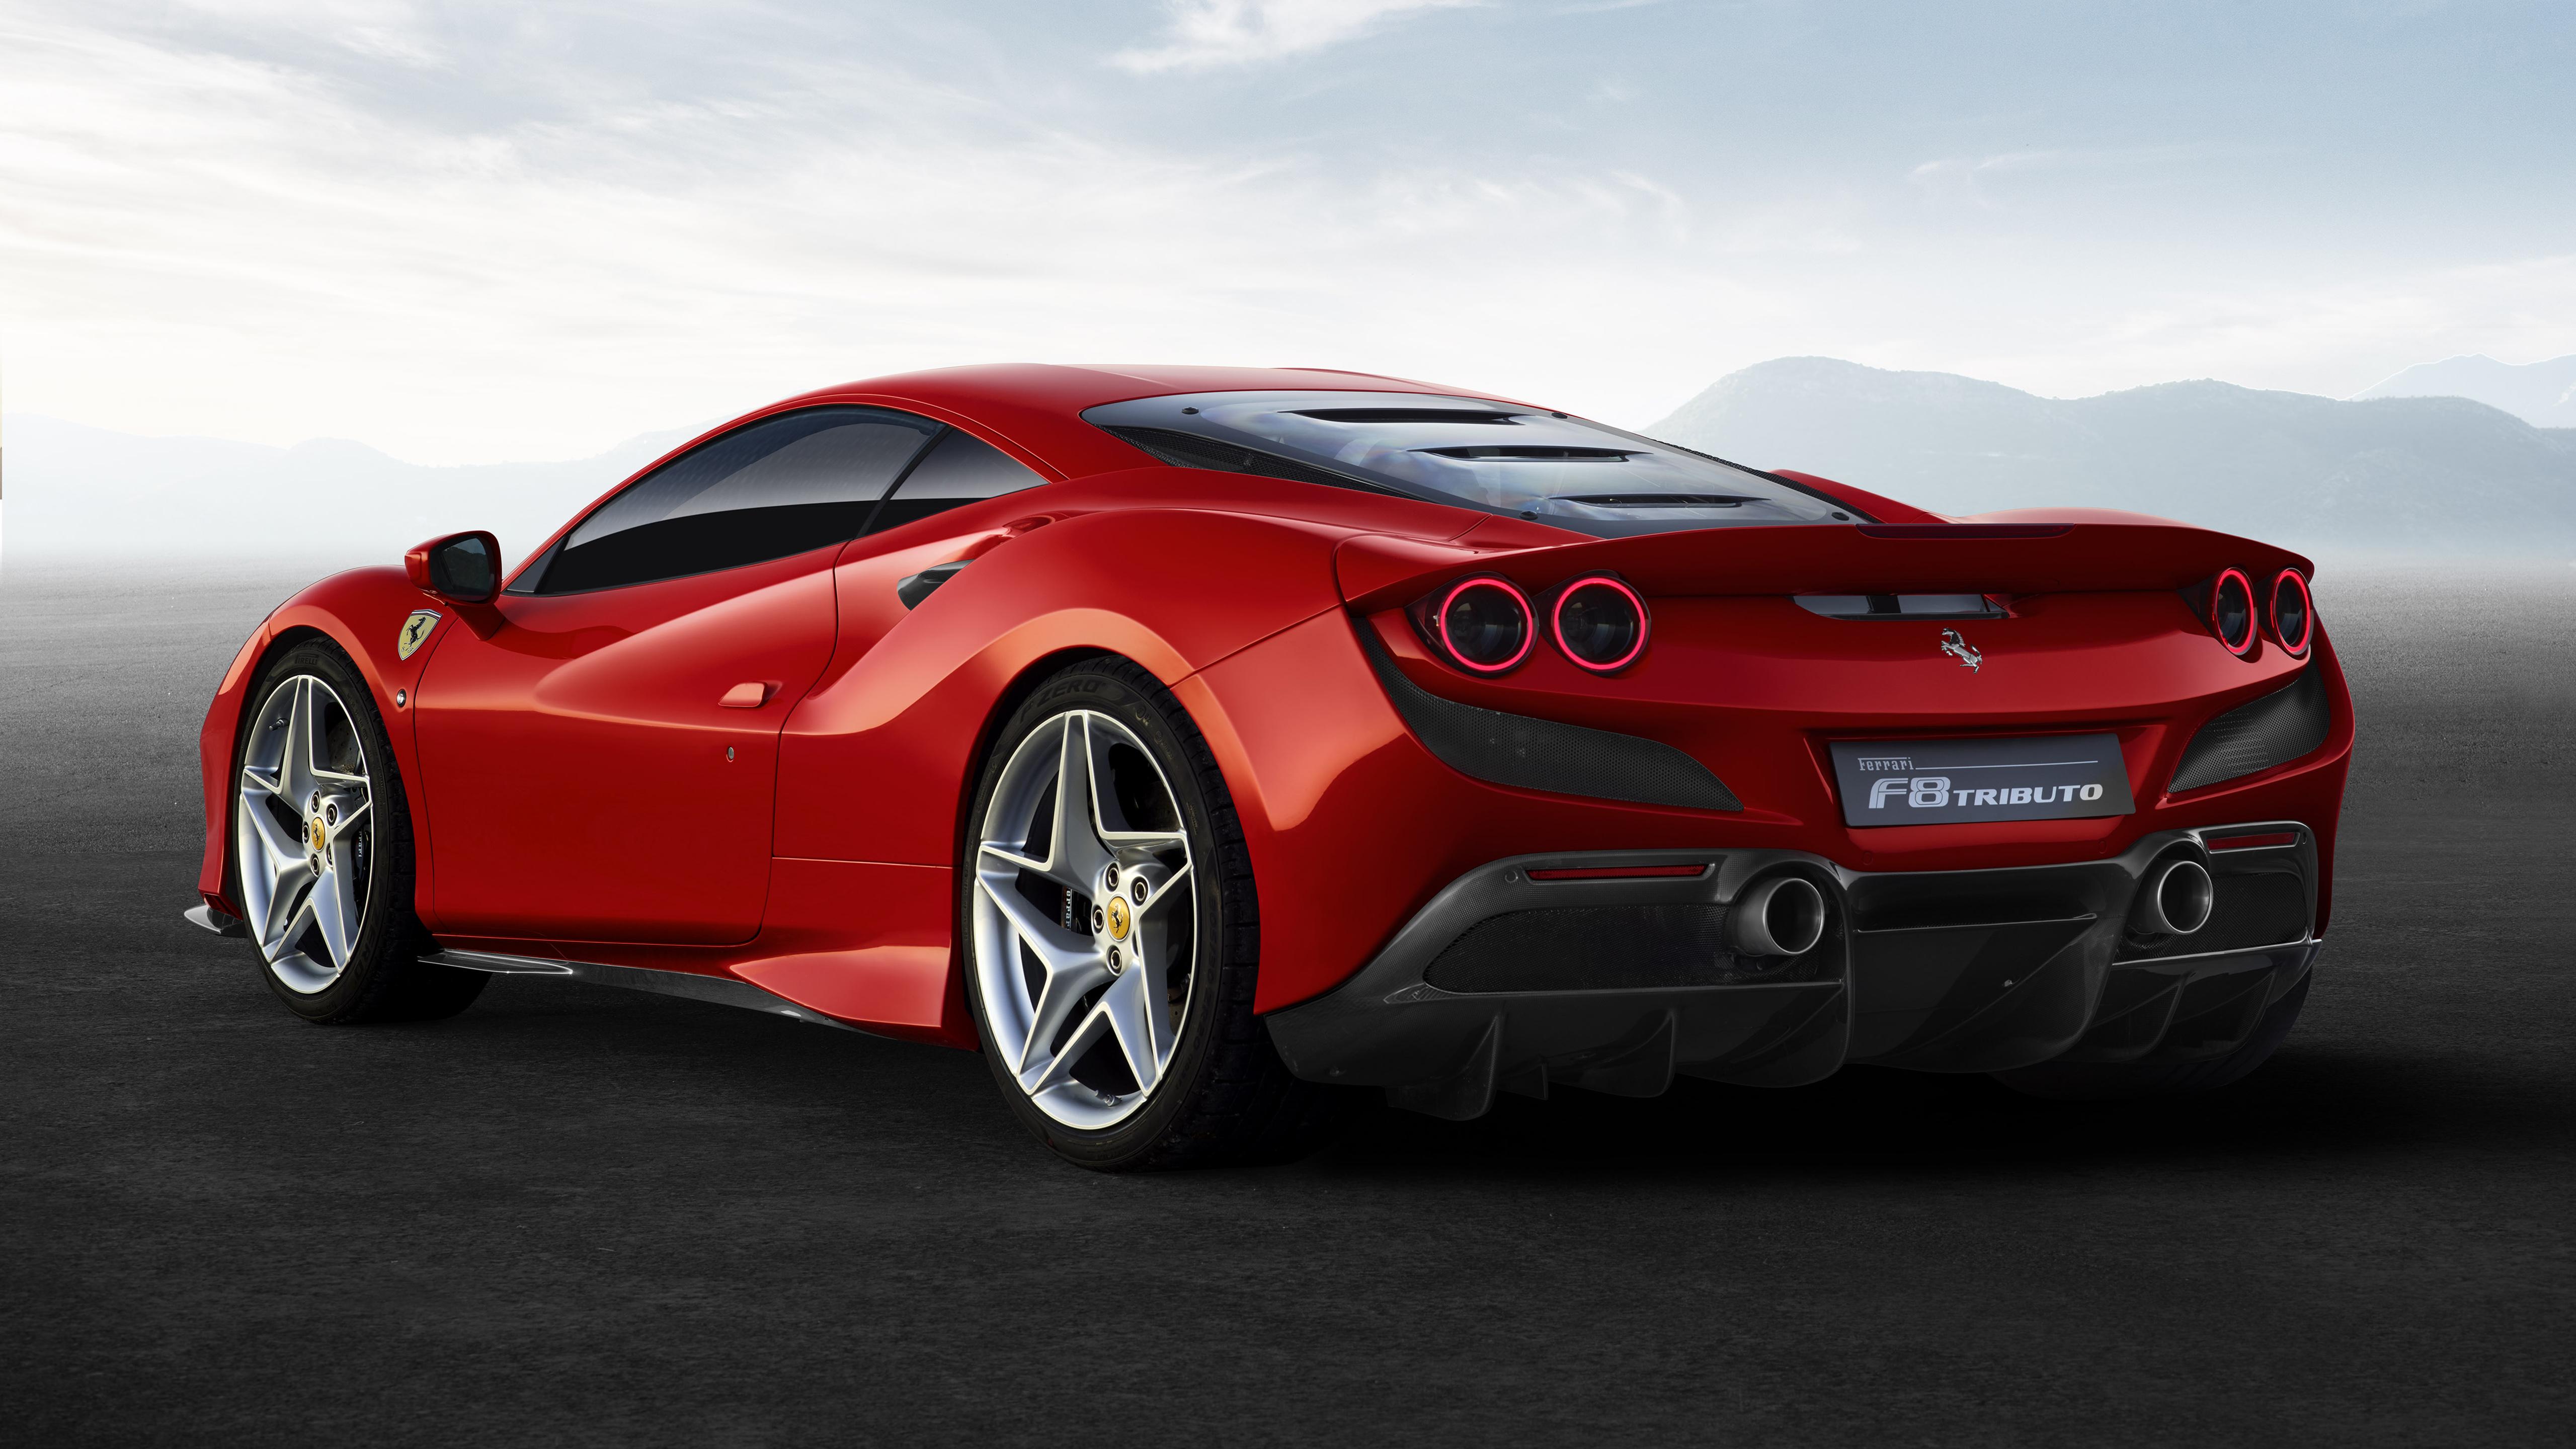 Ferrari Car Wallpaper 4K